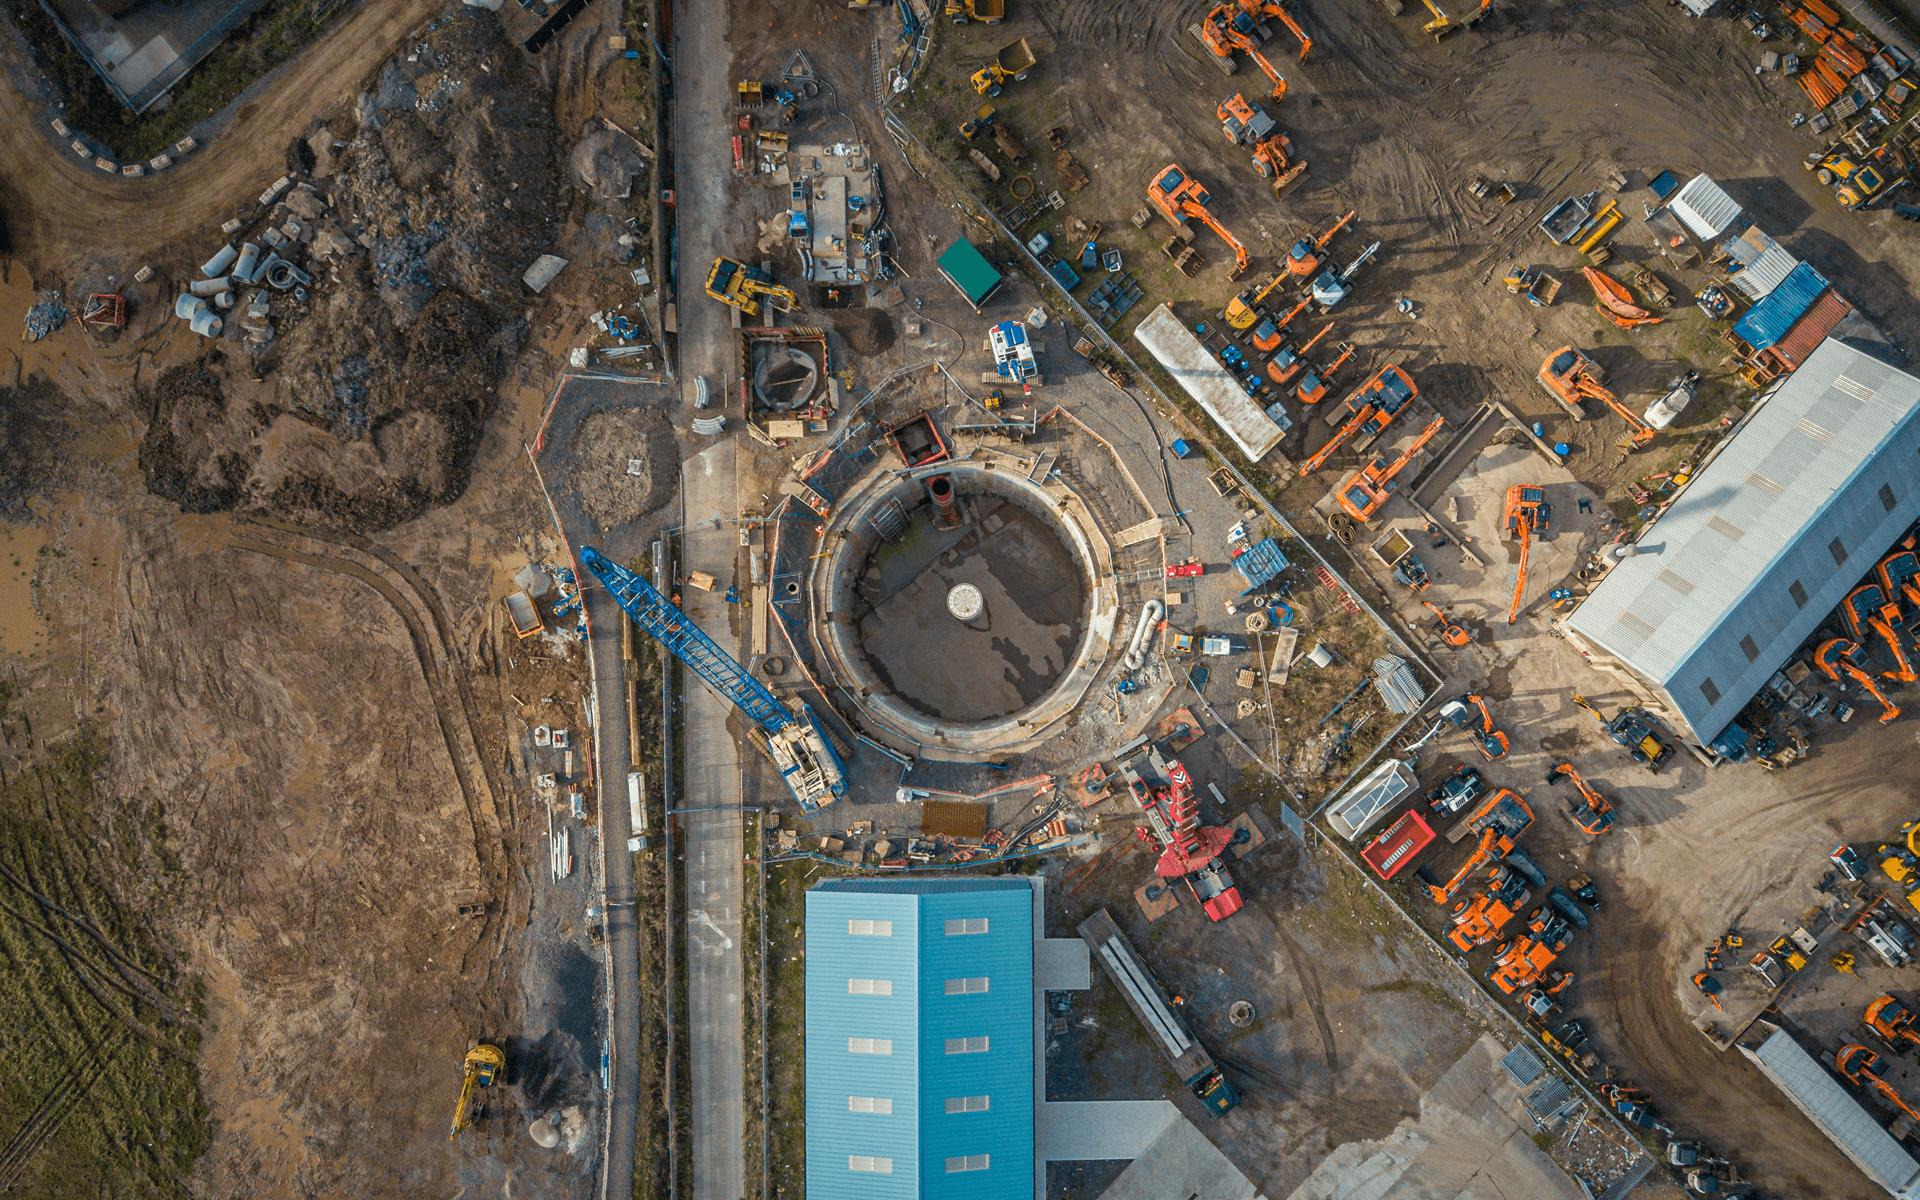 """Mavic Pro"" aerial drone photo of a ""LEWIS Civil Engineering"" flood overflow sewage tank in Bridgwater"